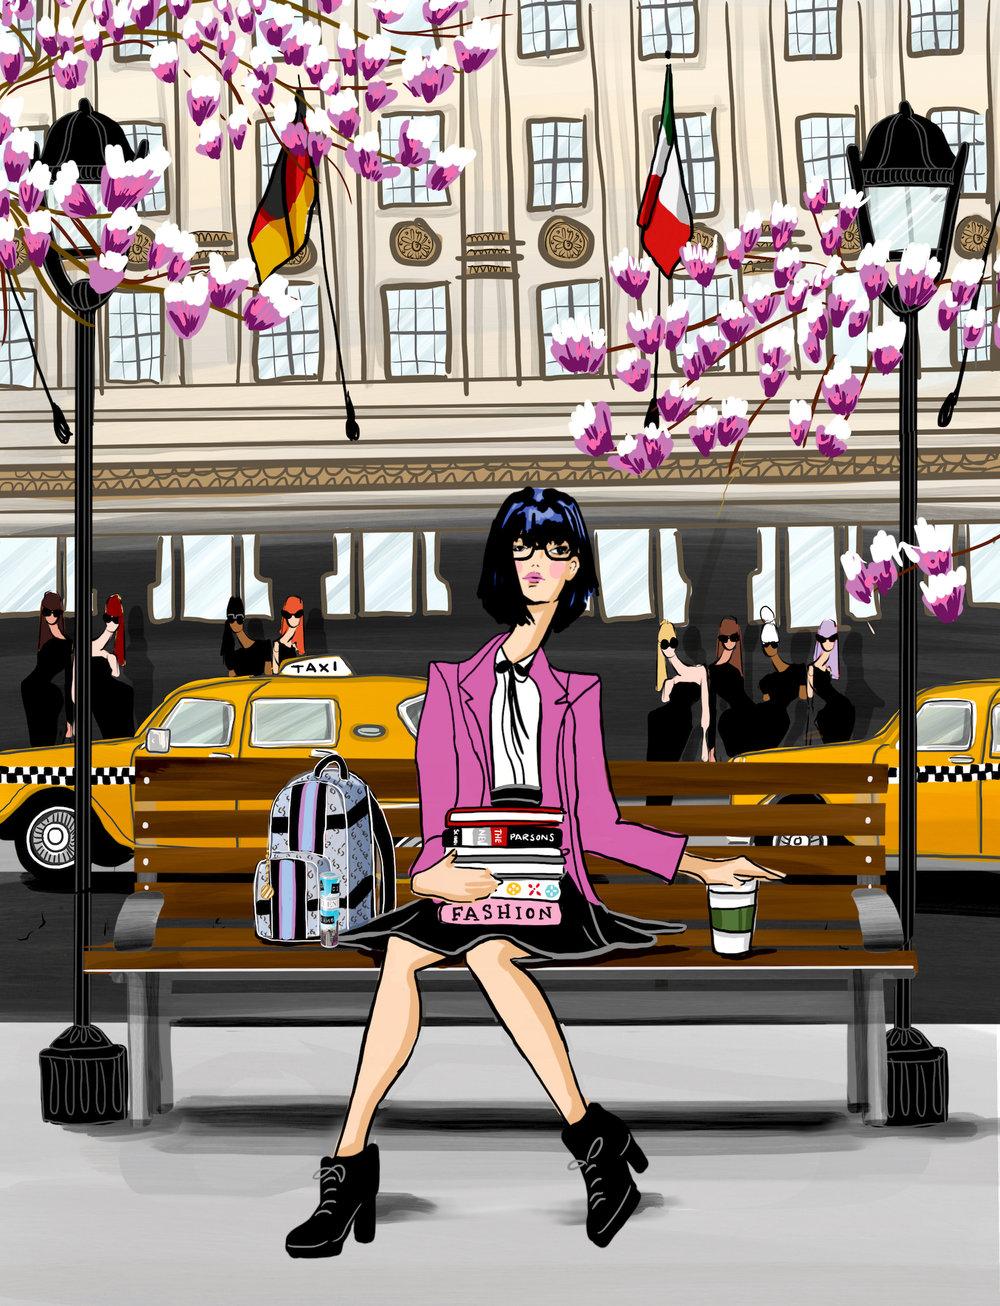 city dreams girl.jpg